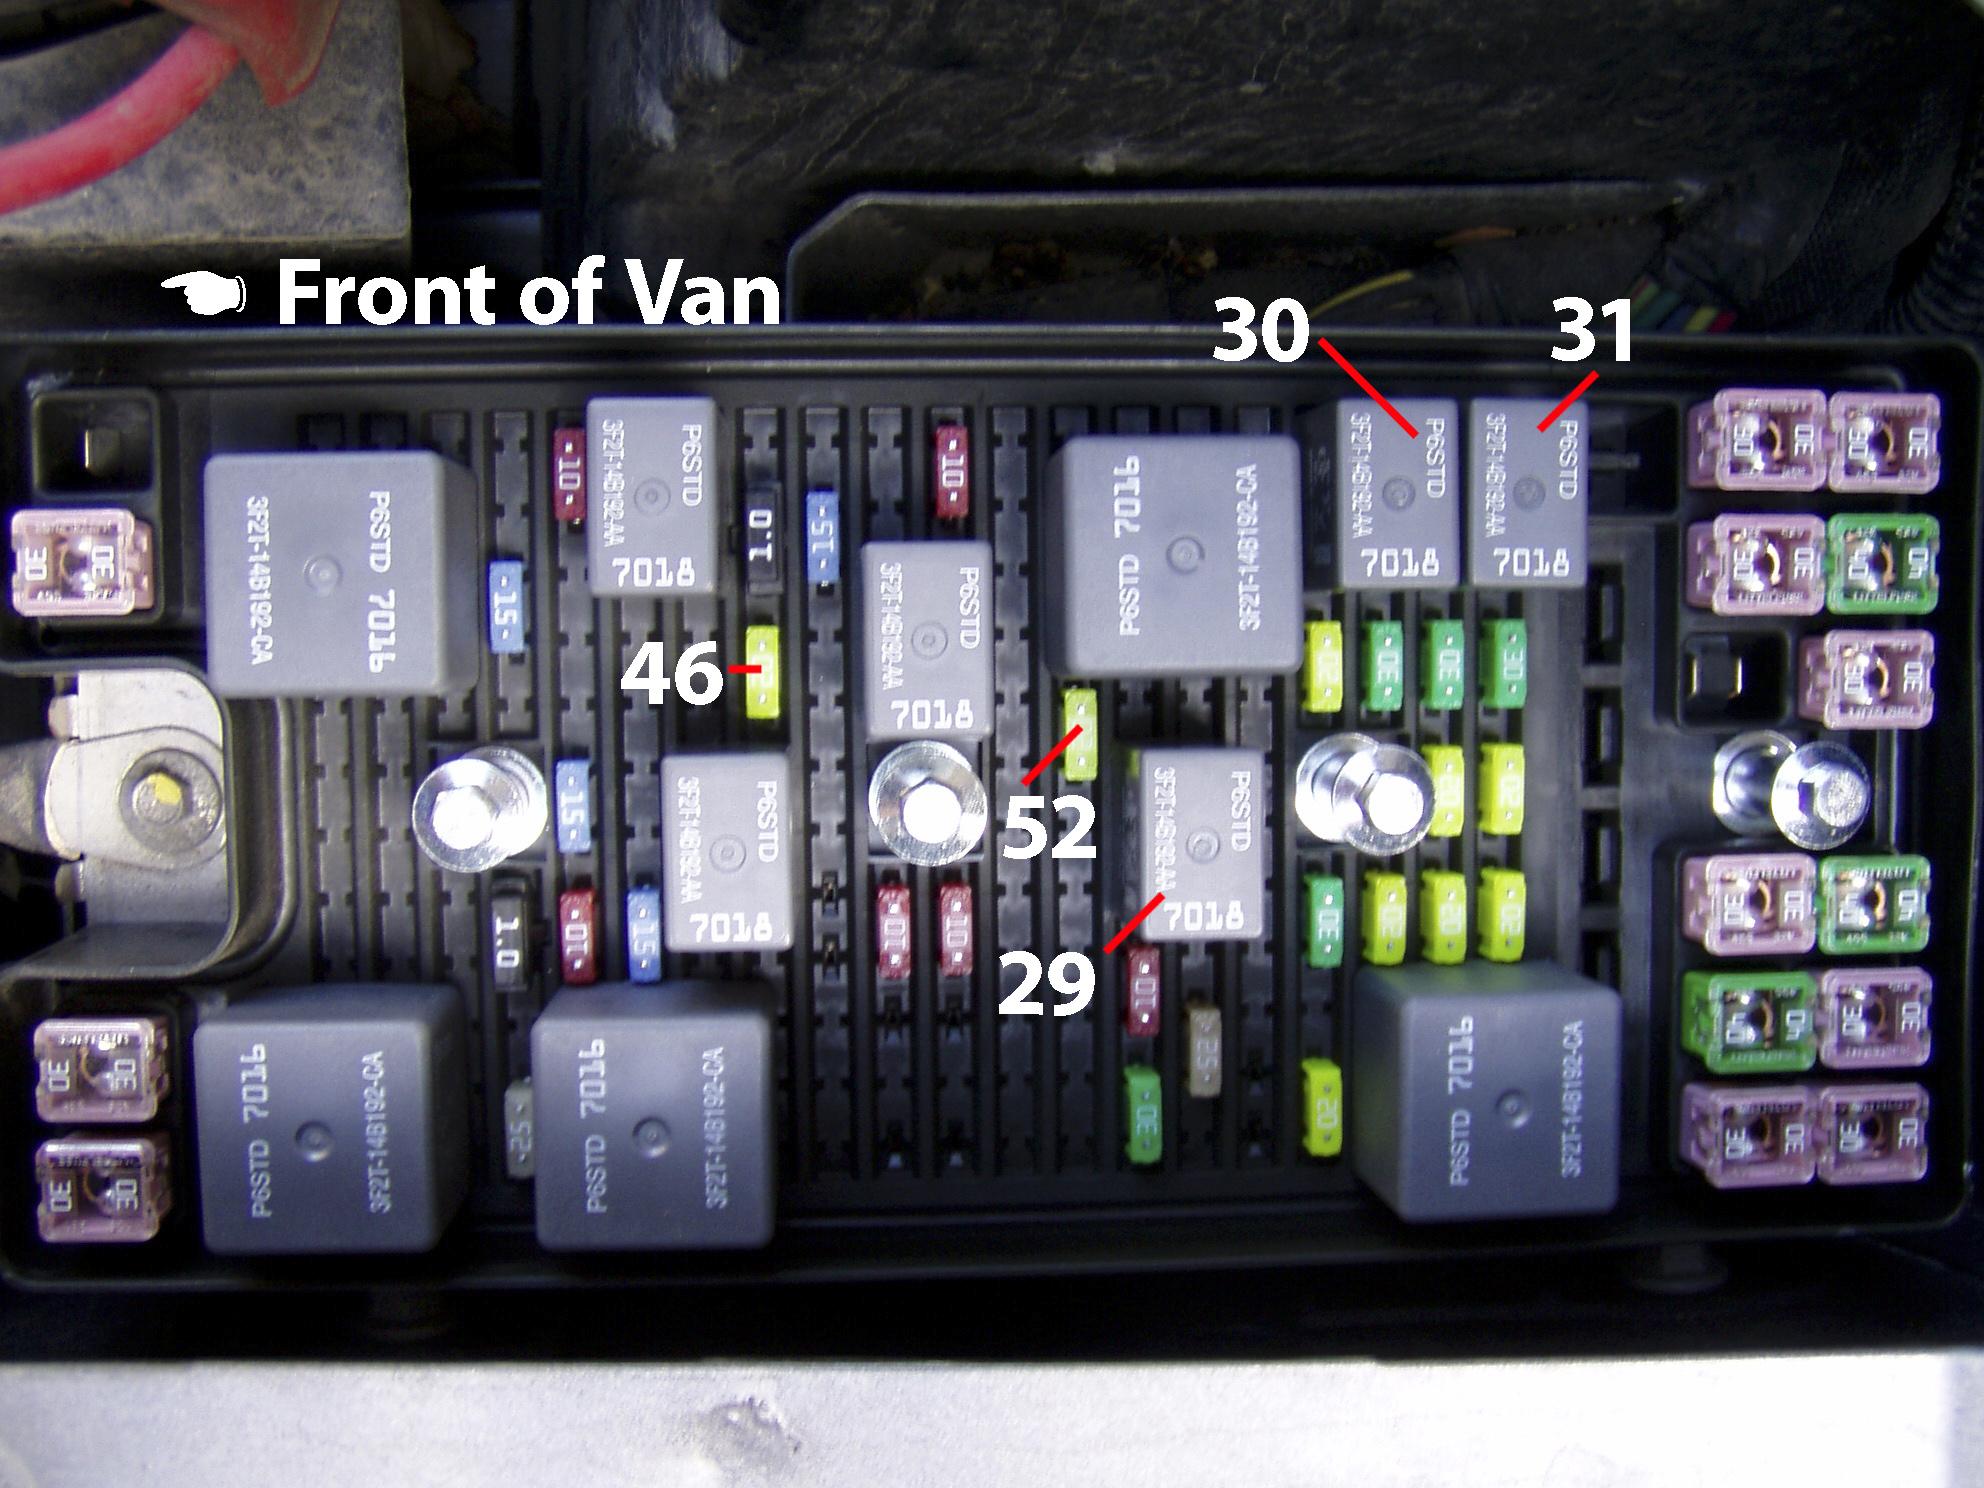 2005 Ford Windstar Fuse Box Wiring Diagram System Bite Locate Bite Locate Ediliadesign It